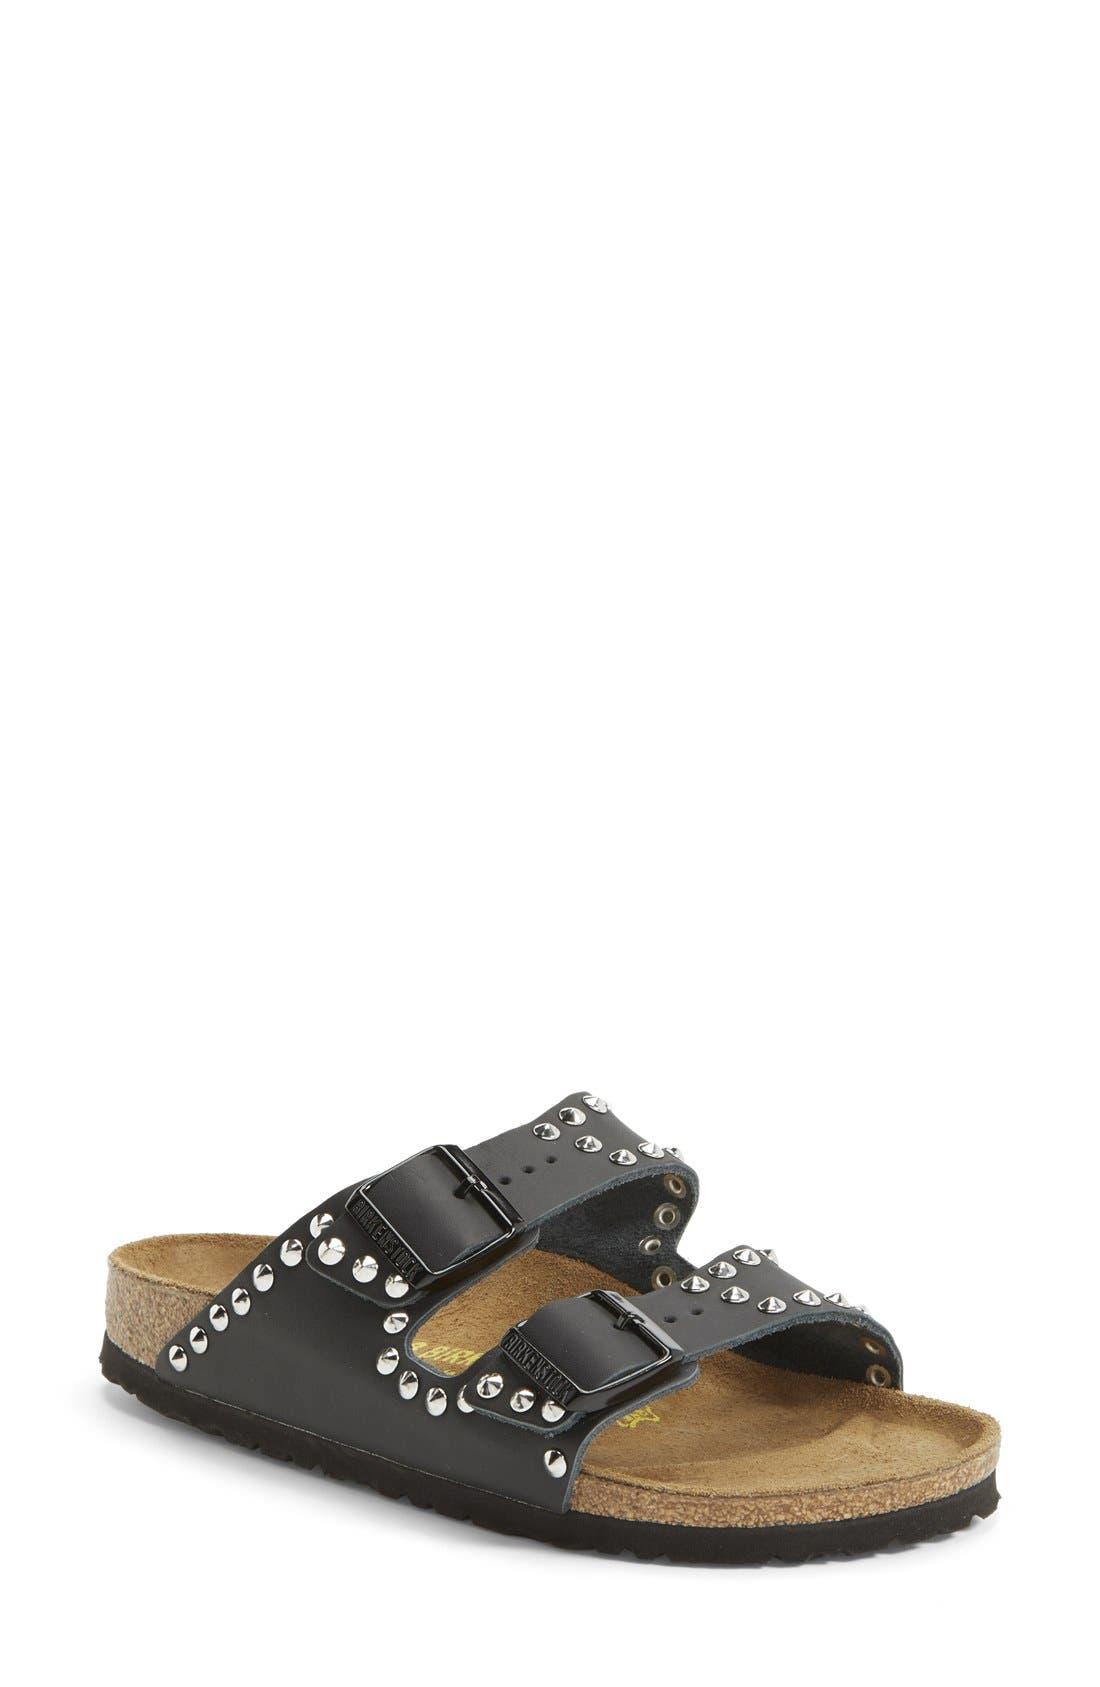 Main Image - Birkenstock 'Arizona' Studded Leather Sandal (Women)